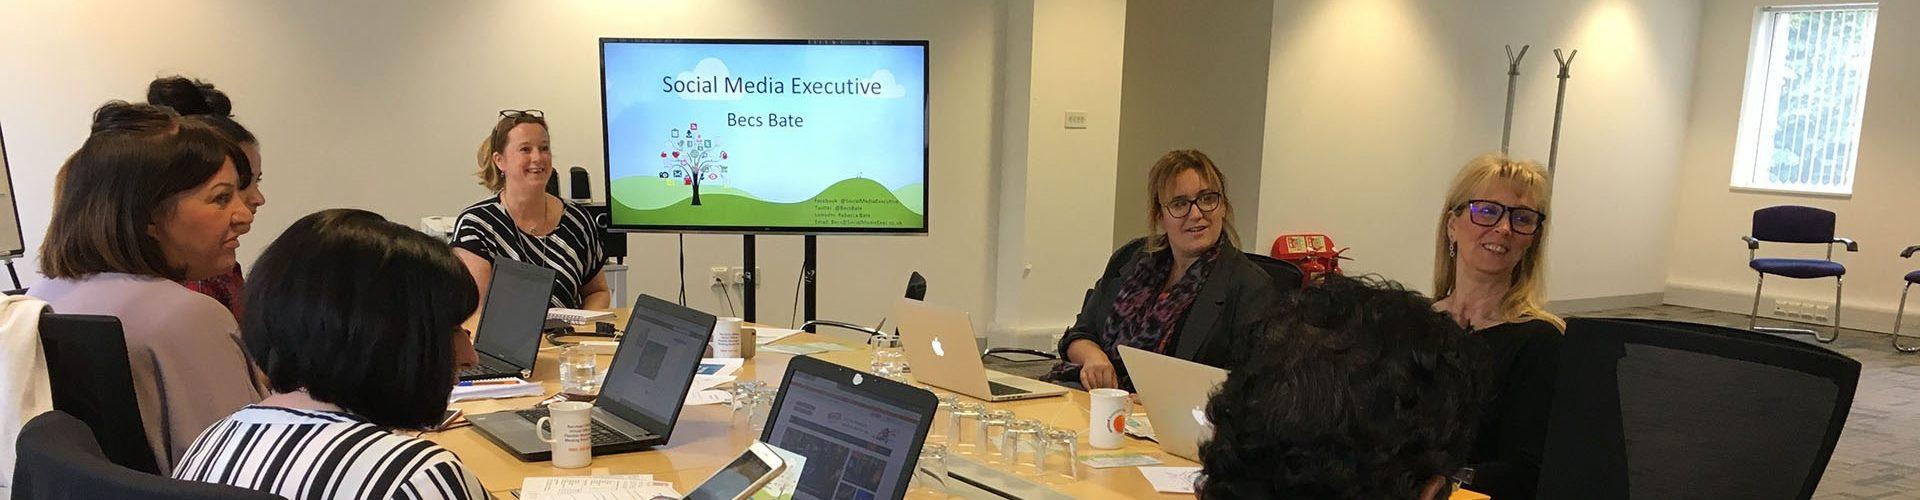 Becs Bate, Social Media Consultant providing Social Media Training to a business